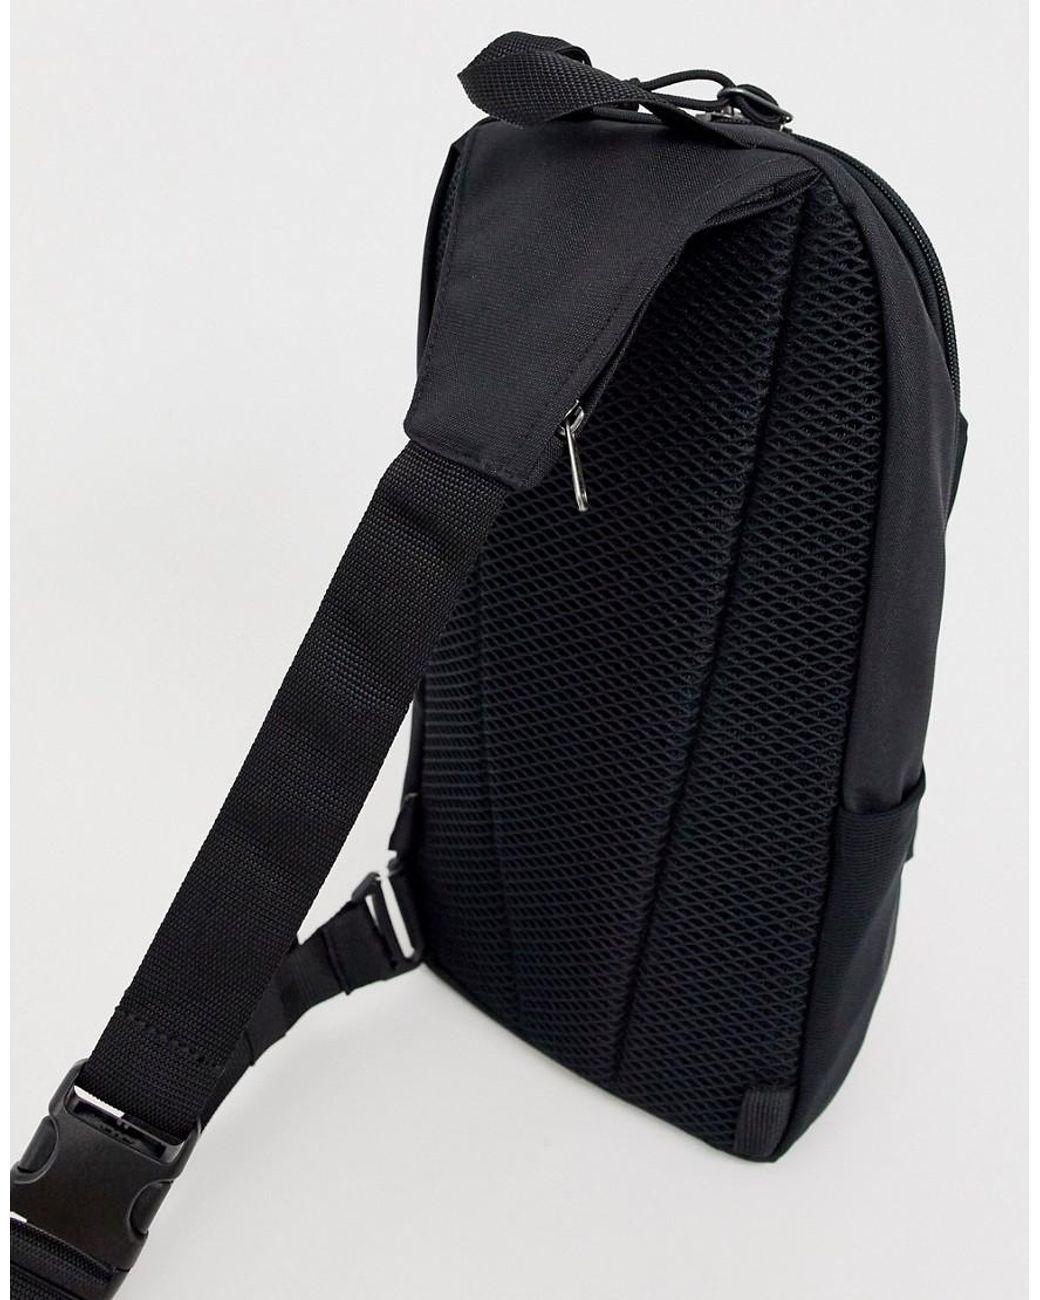 Wrap Large Crossbody Bag In Black